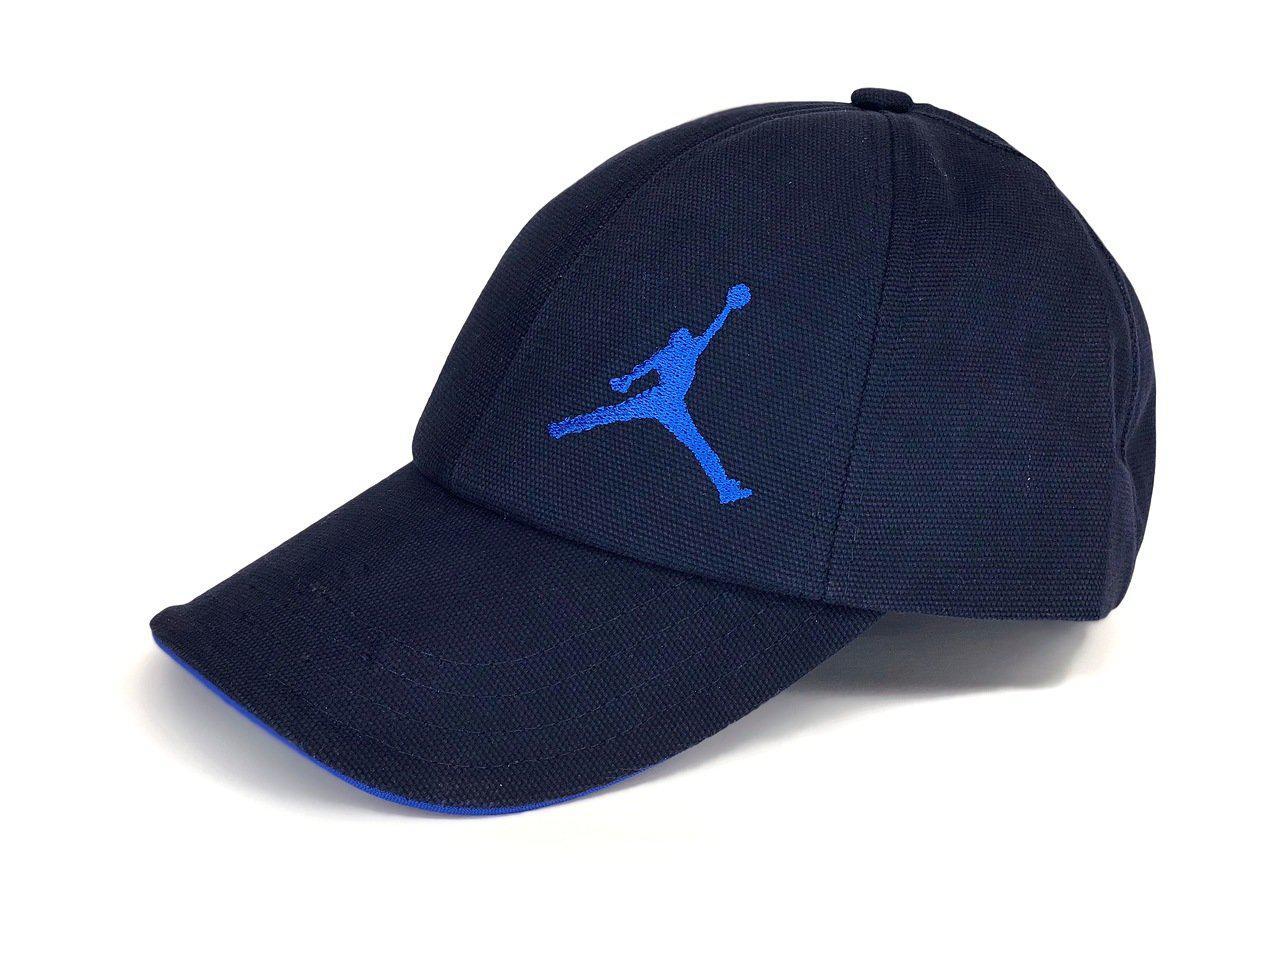 Бейсболка кепка Jordan, синяя, лого синий вышито слева, фото 1